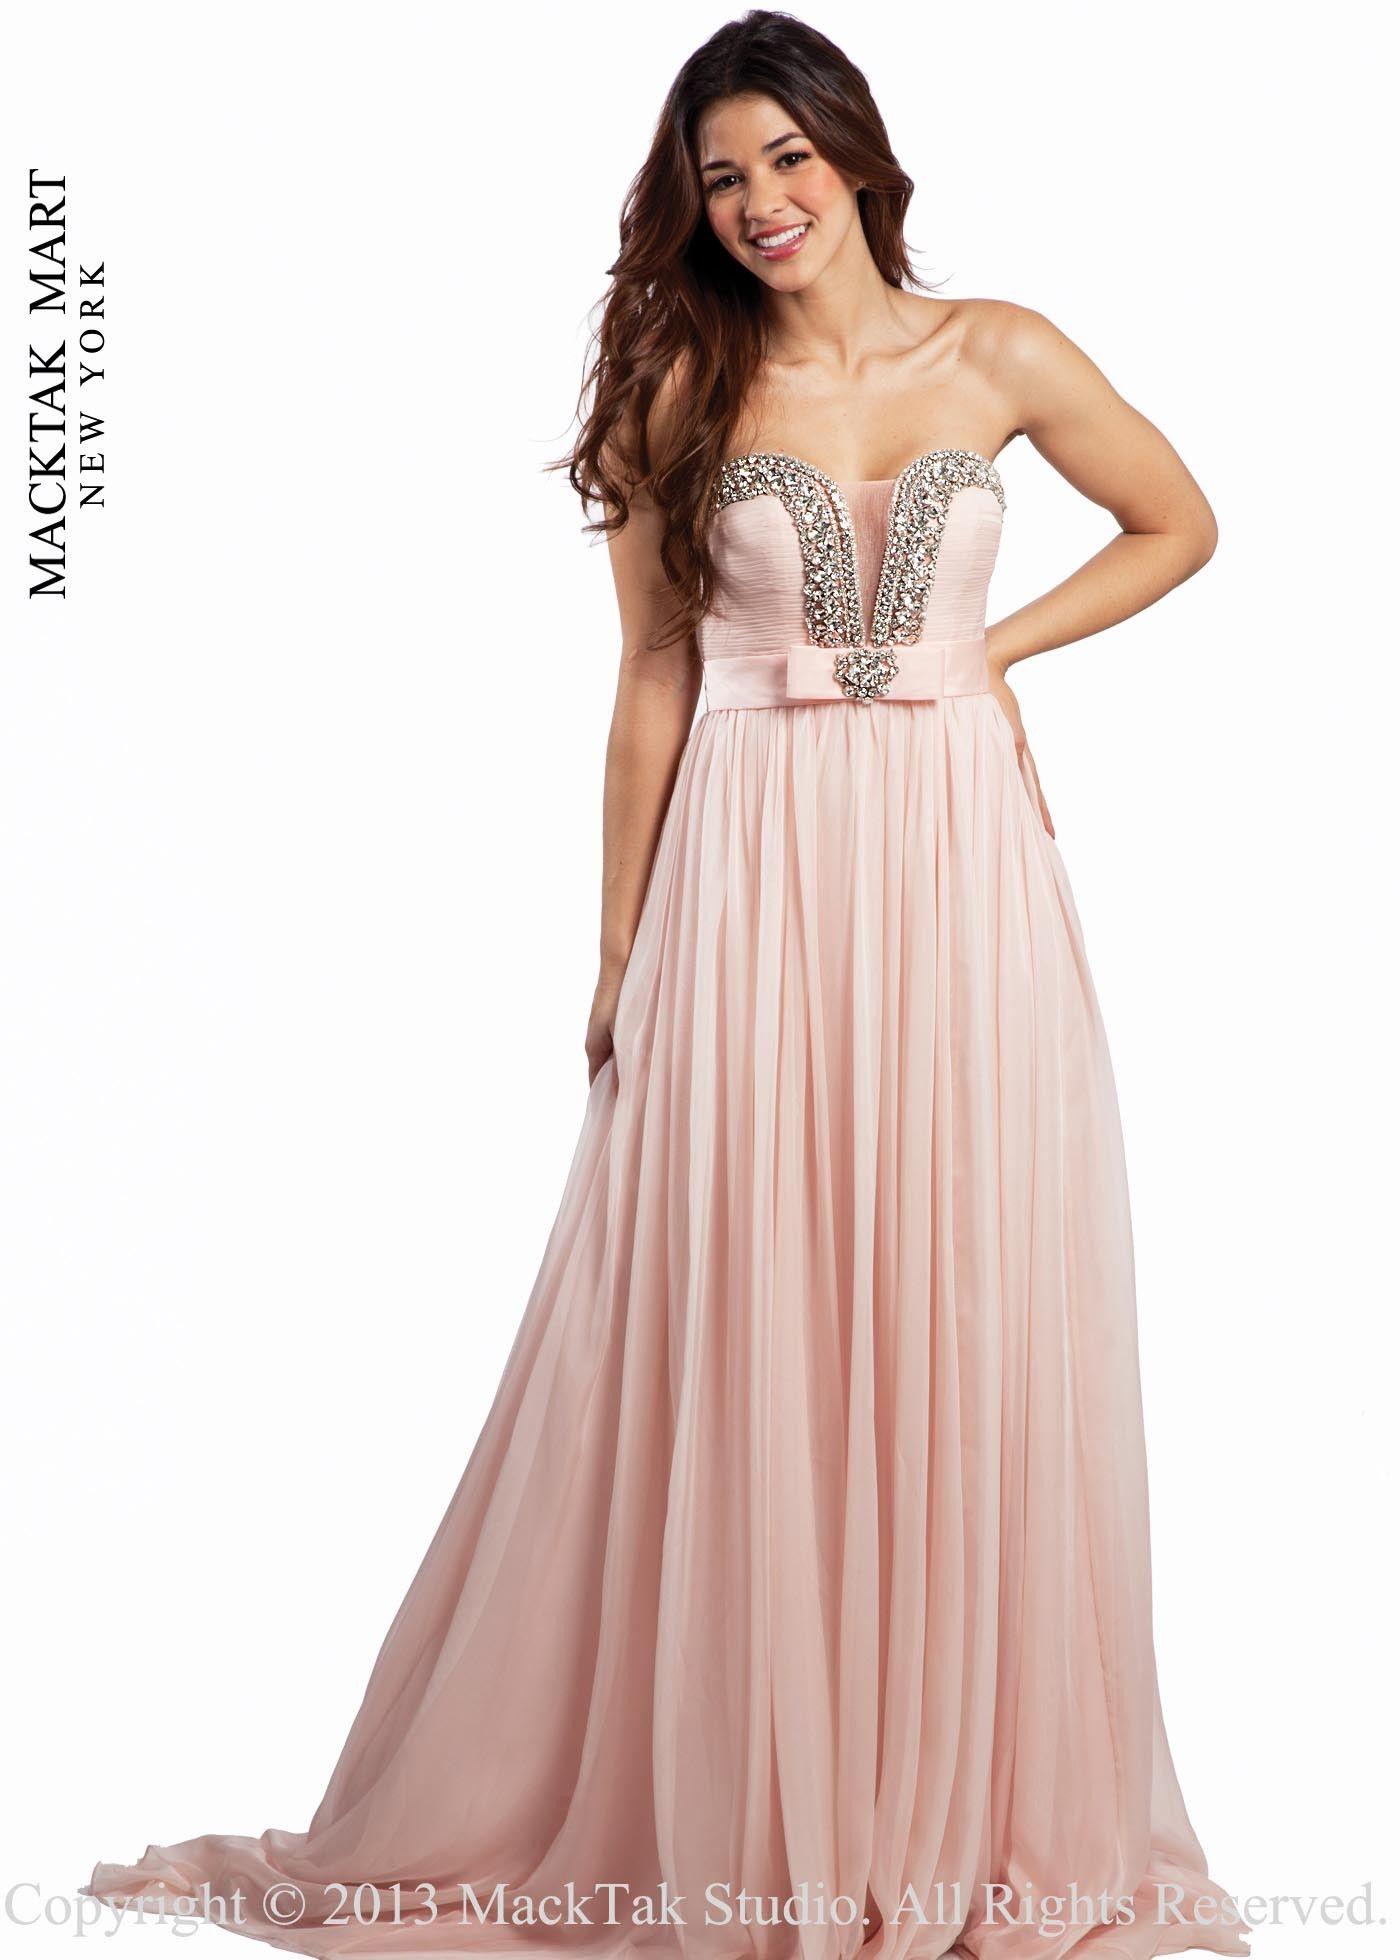 Sherri Hill 1900 Dress $750.00 | Sherri Hill by MackTak | Pinterest